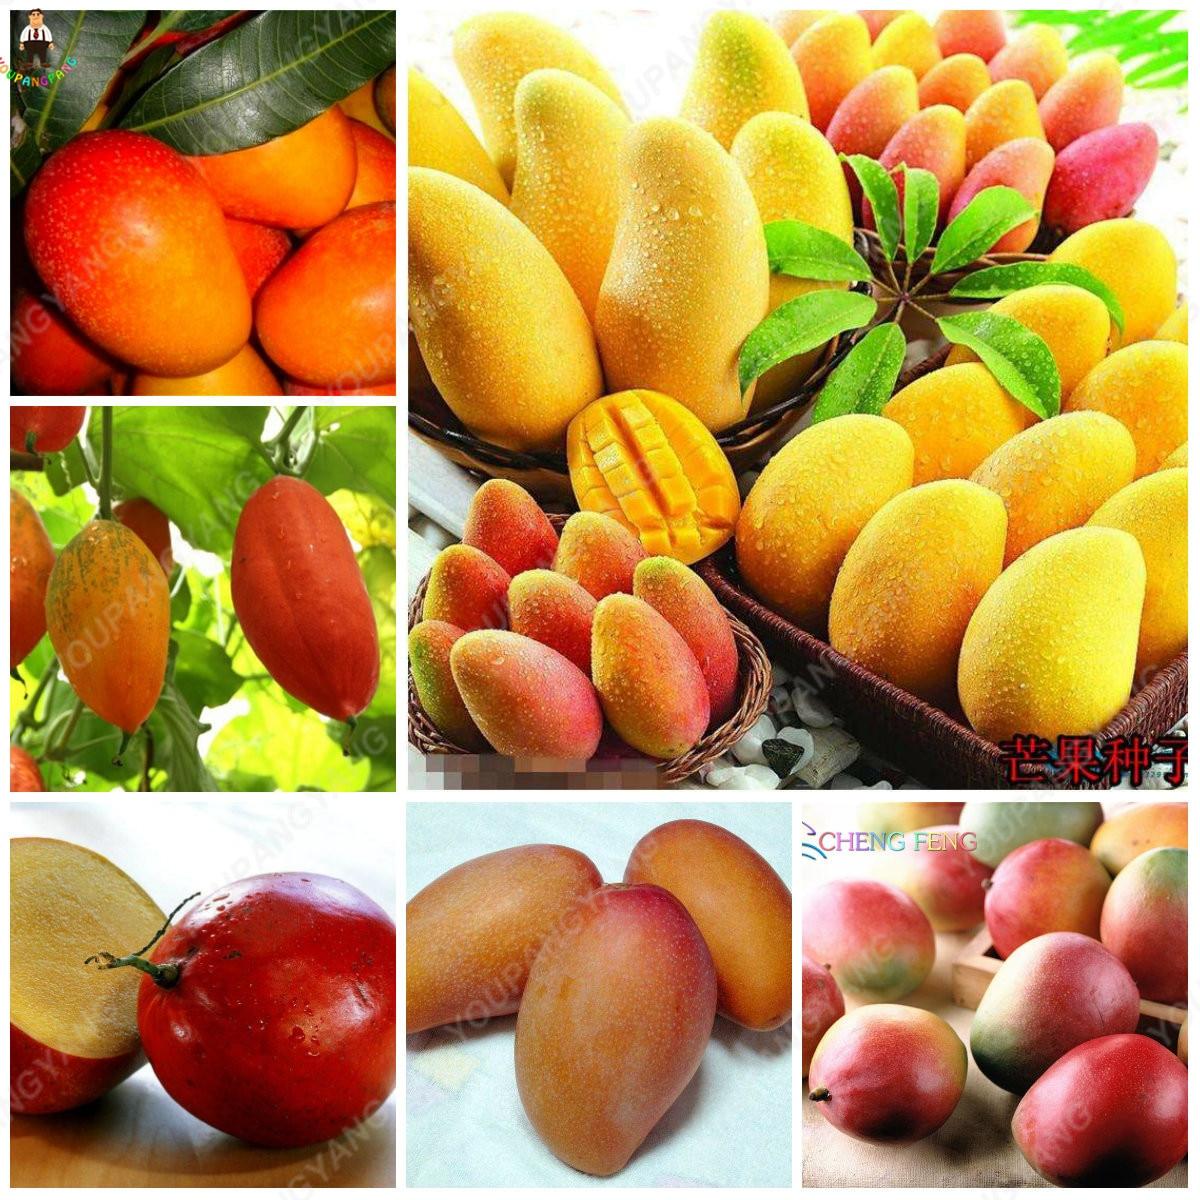 1pcs Mini Mango Tree Bonsai Tree Bonsai Organic Fruits And Vegetables Bonsai Pot For Home Garden Planting Buy At The Price Of 0 88 In Aliexpress Com Imall Com